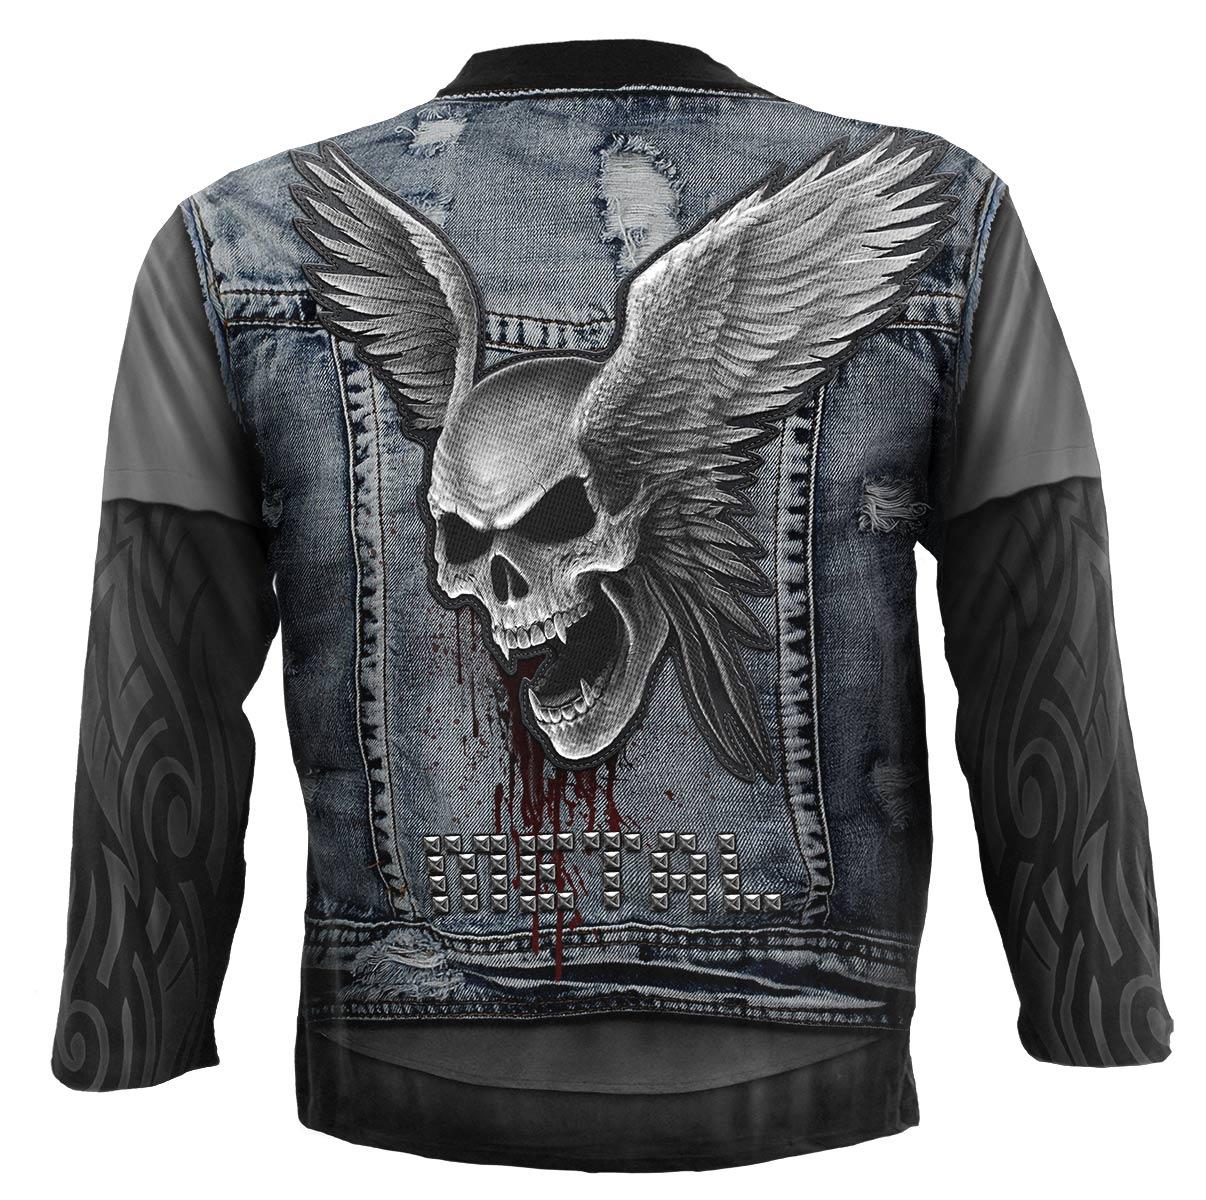 SPIRAL Thrash Metal Langarm Shirt Rundumdruck W024M304